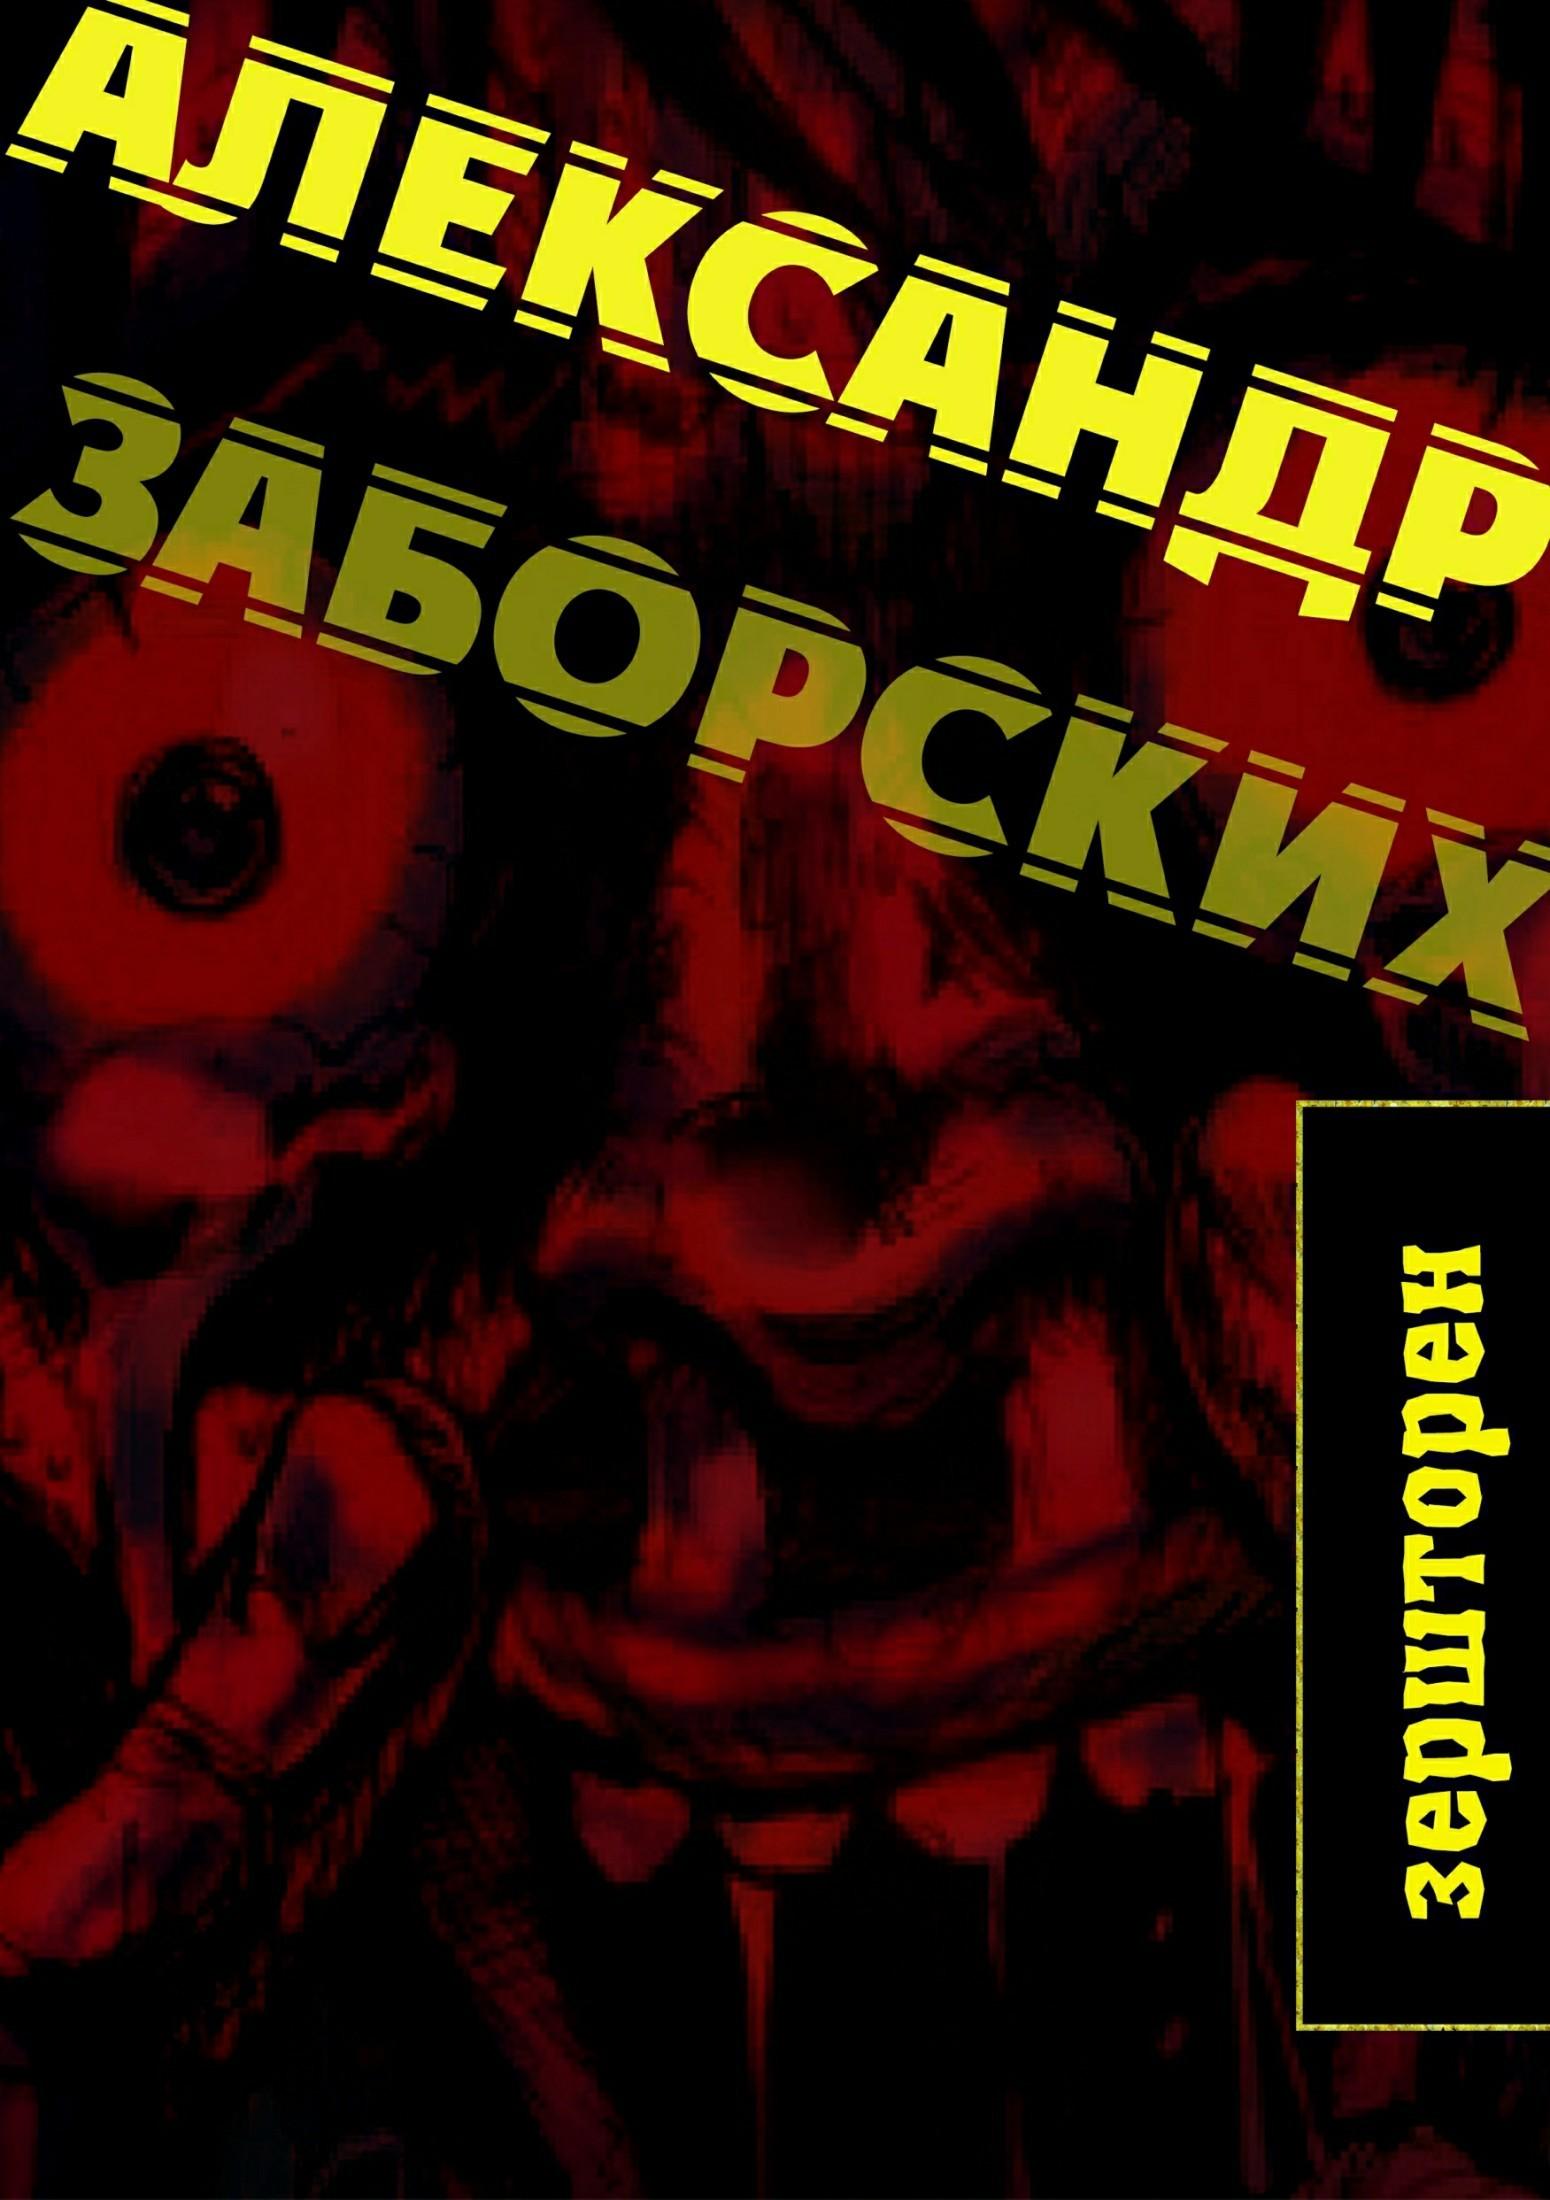 Александр Александрович Заборских бесплатно